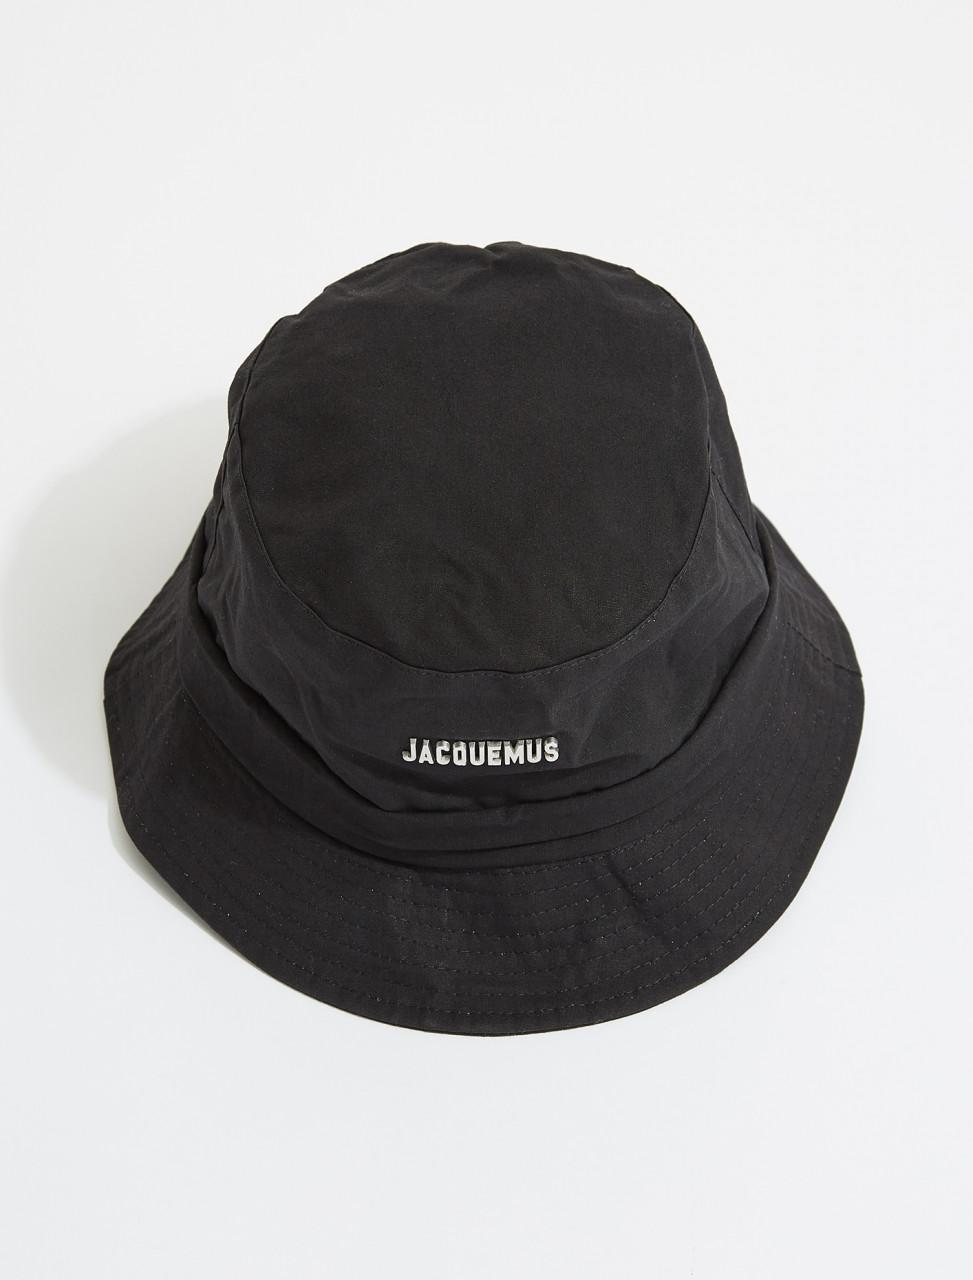 215AC03-215-504990 JACQUEMUS LE BOB GADJO HAT BLACK